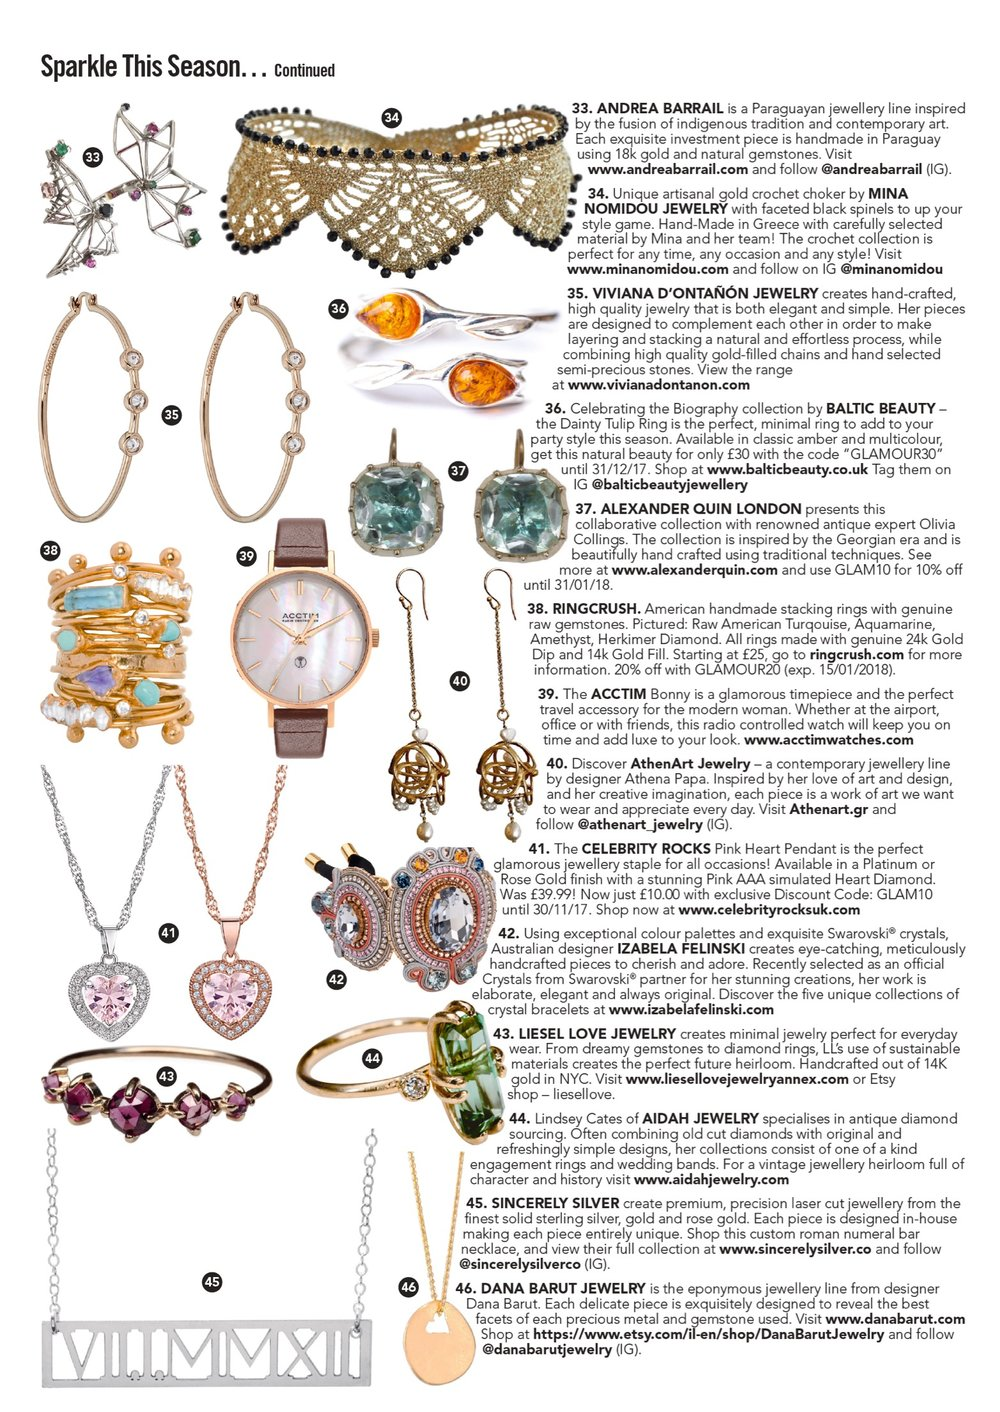 - https://www.minanomidou.com/necklaces/crochet-gold-black-spinel-golden-ties-choker